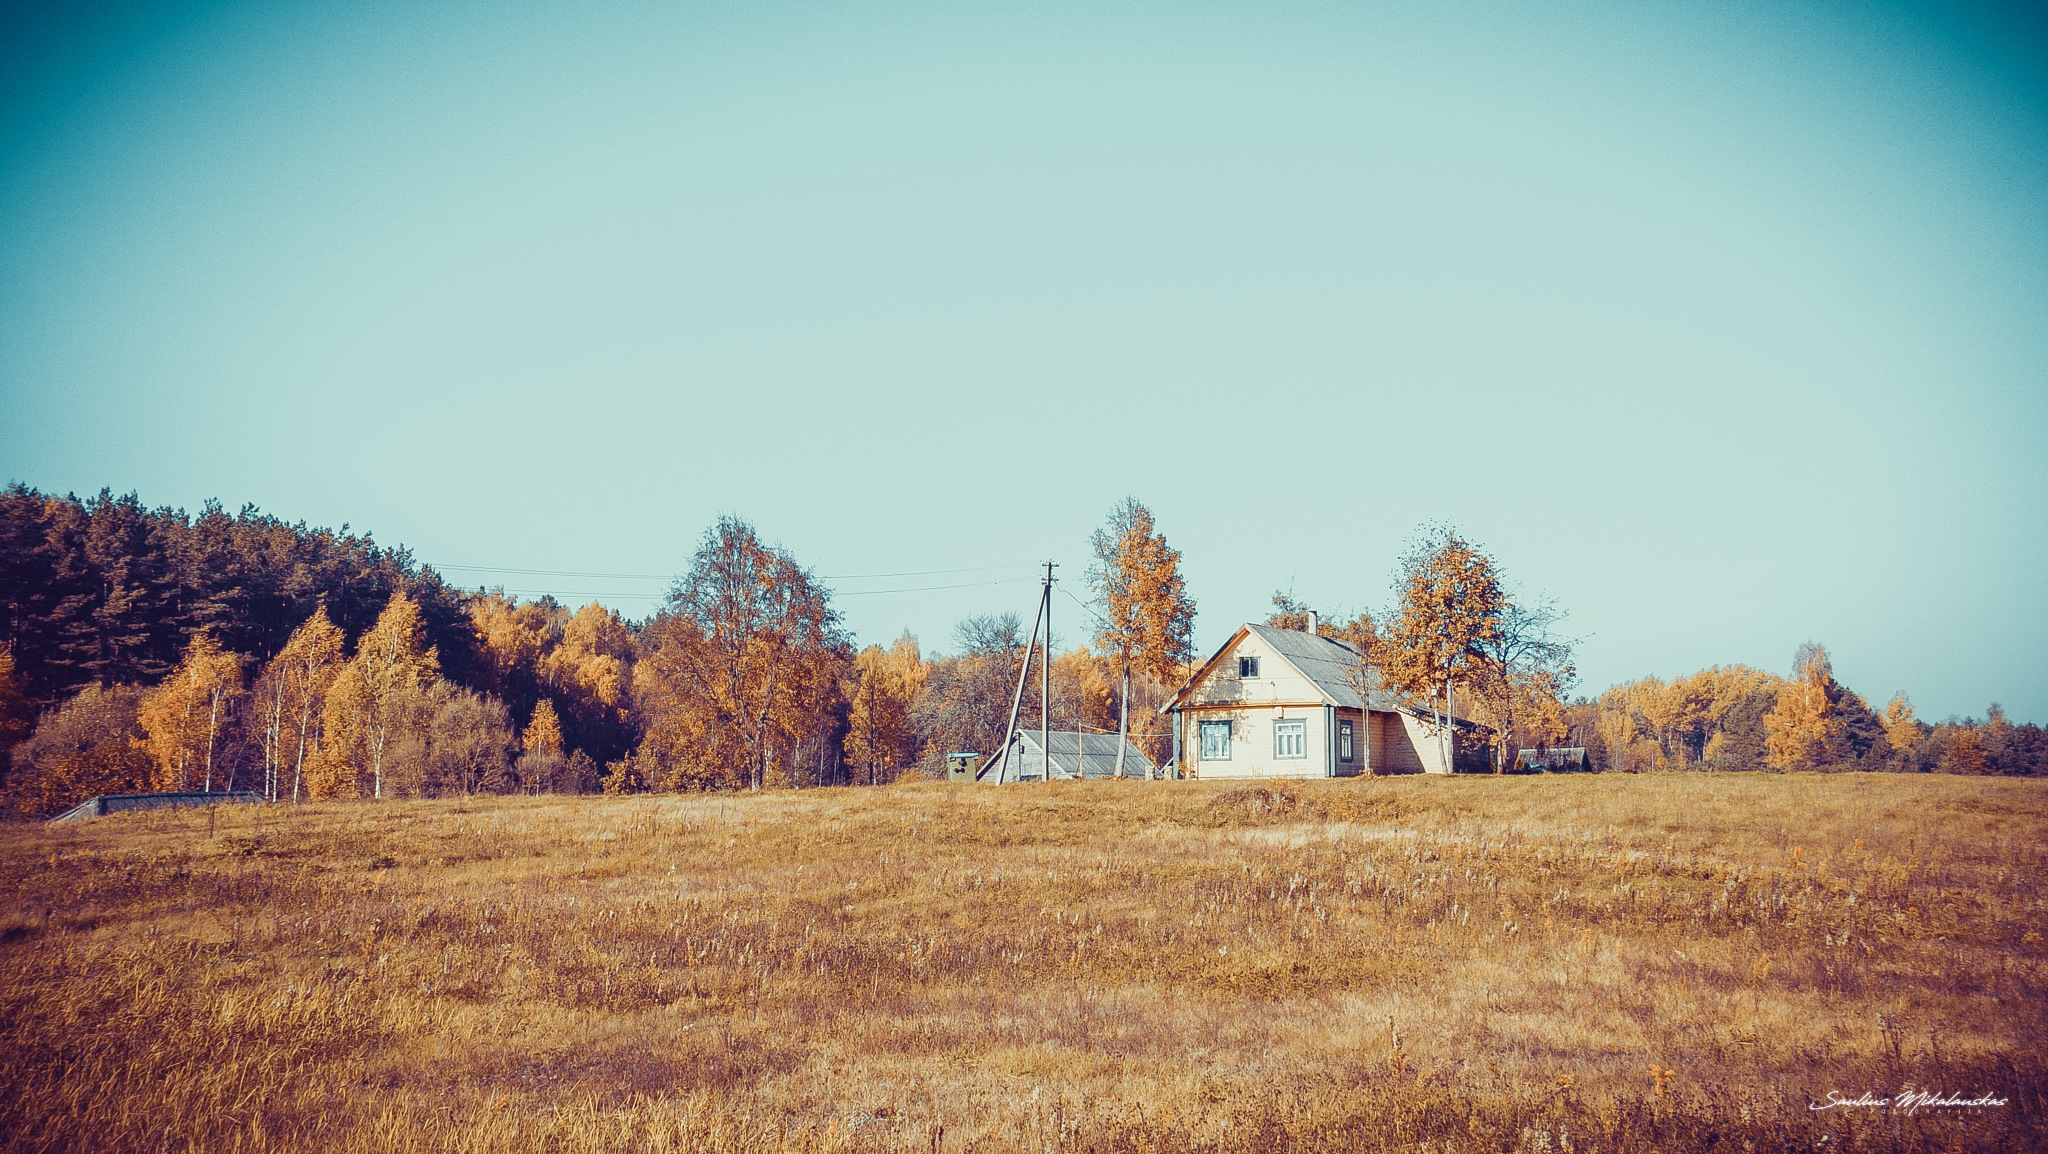 Homestead by Saulius Mikalauskas